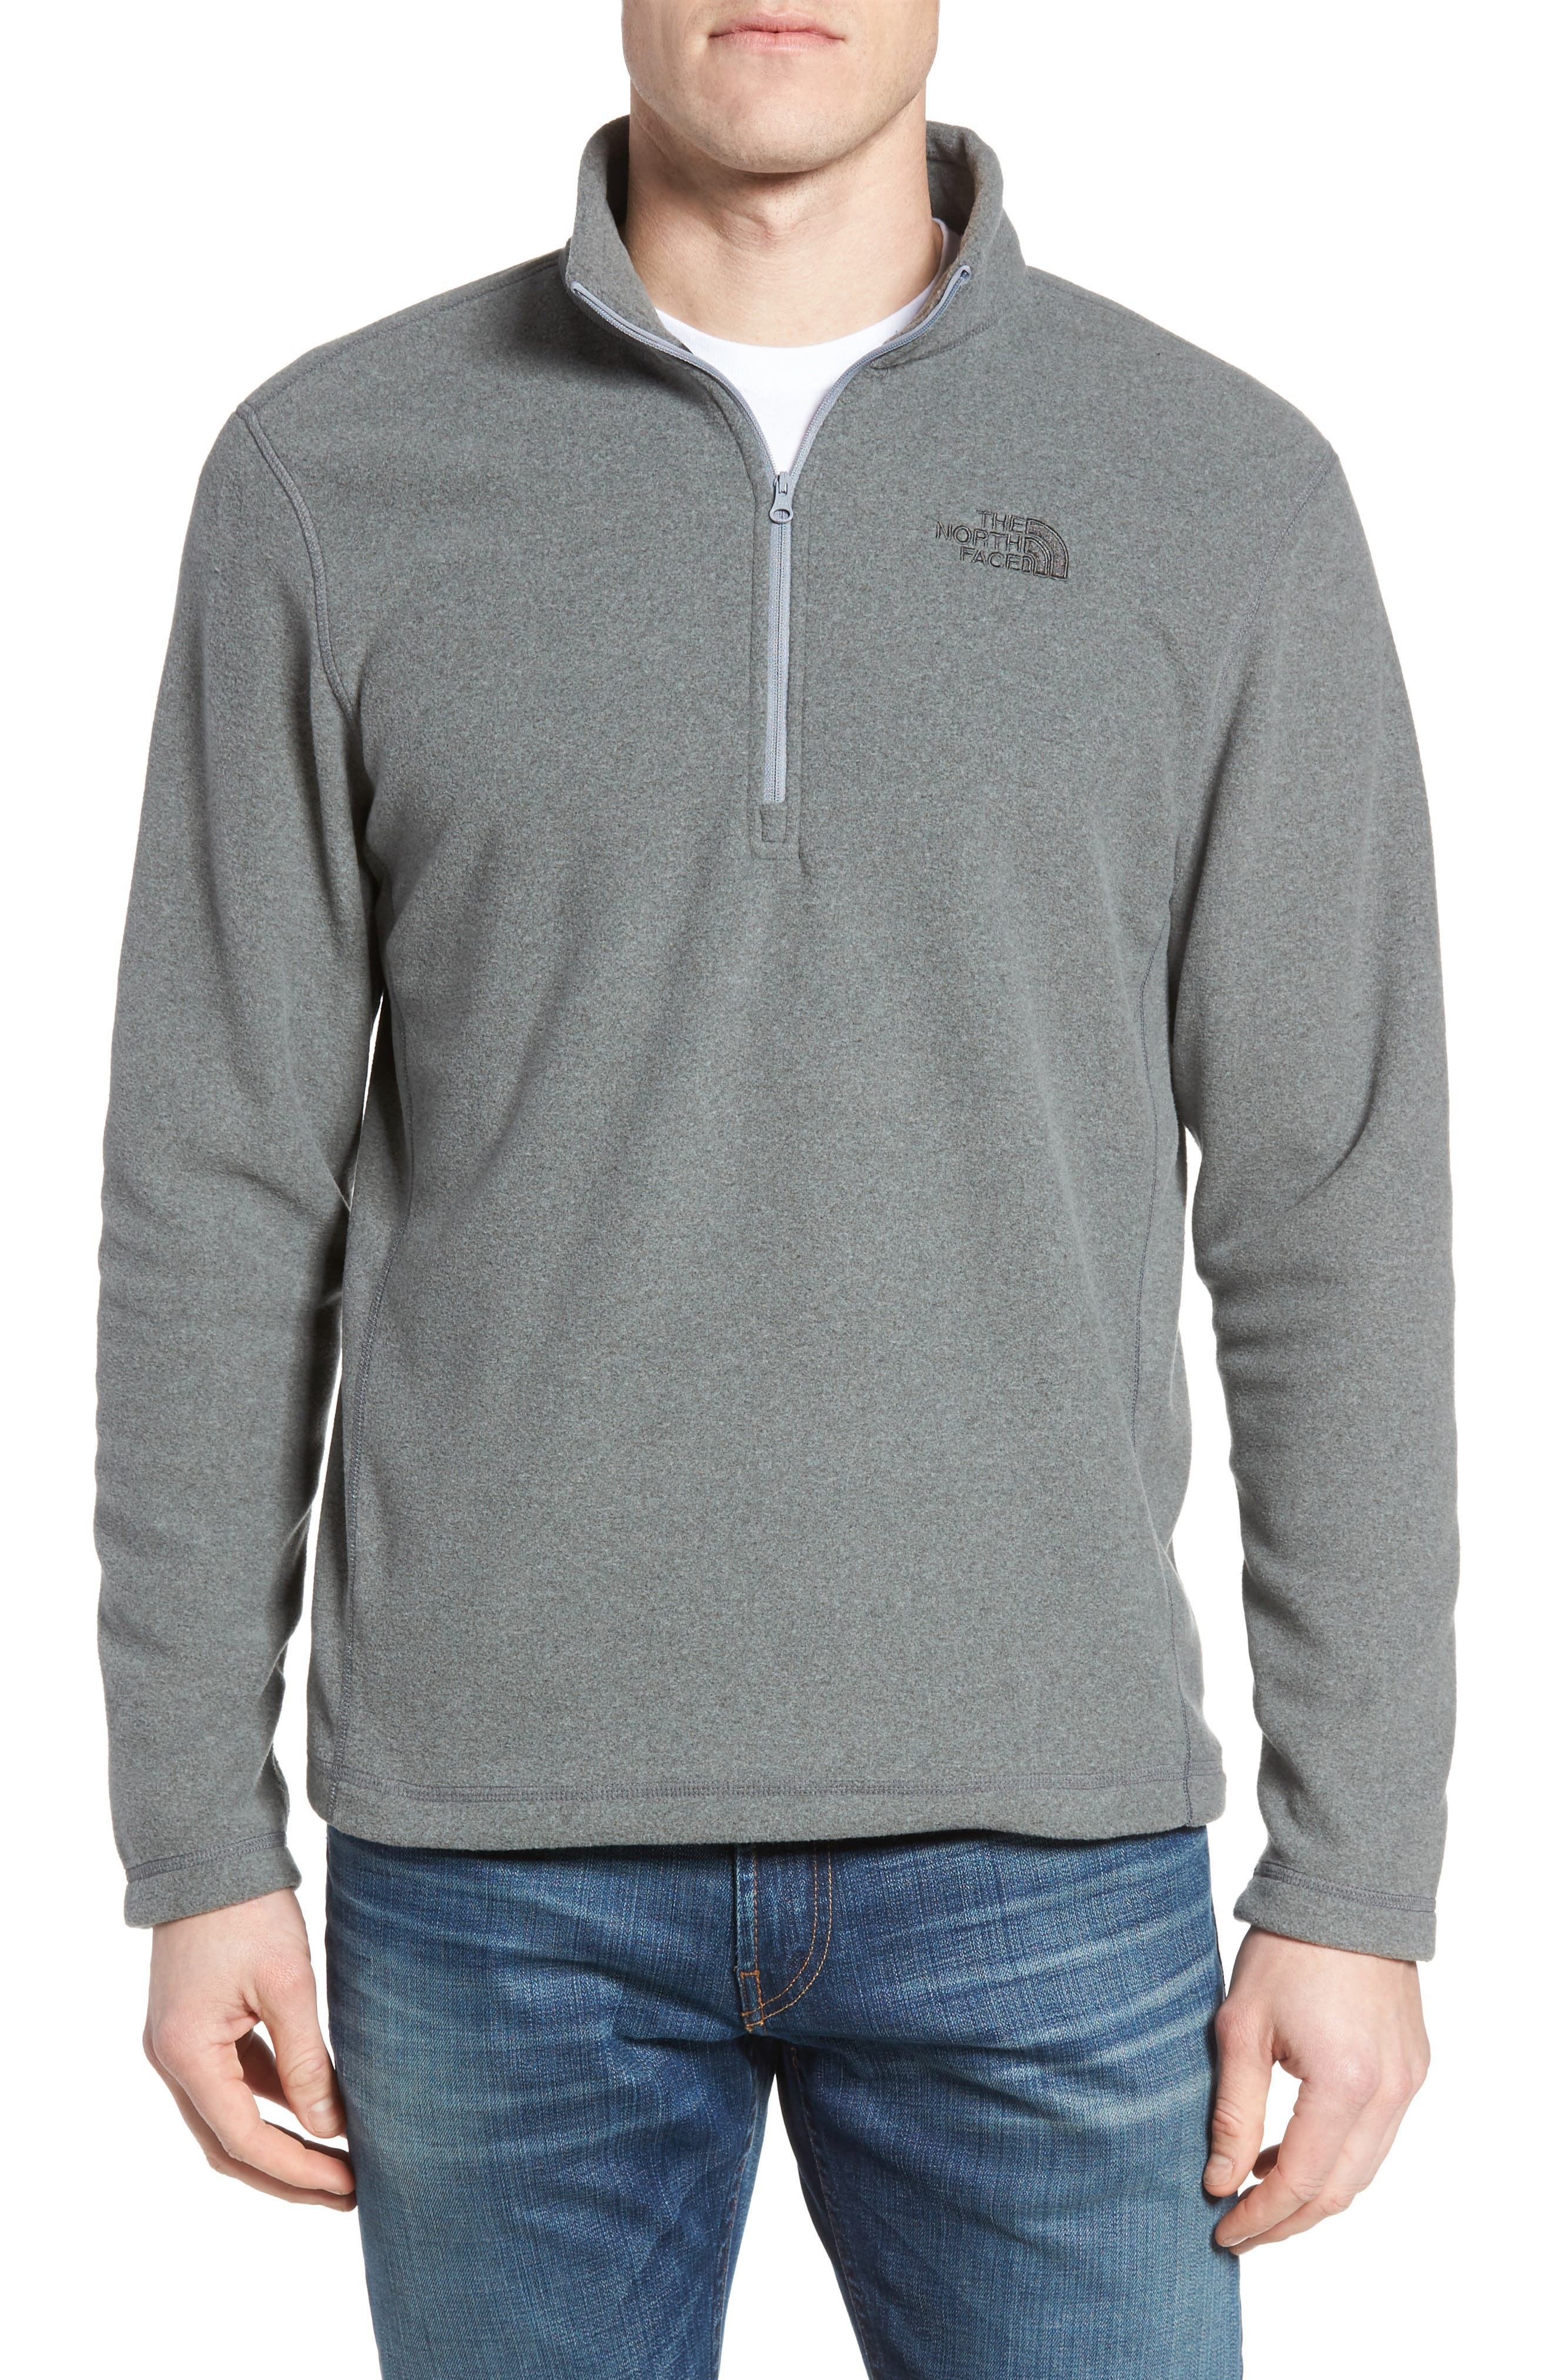 'TKA 100 Glacier' Quarter Zip Fleece Pullover,                         Main,                         color, Tnf Medium Grey Heather